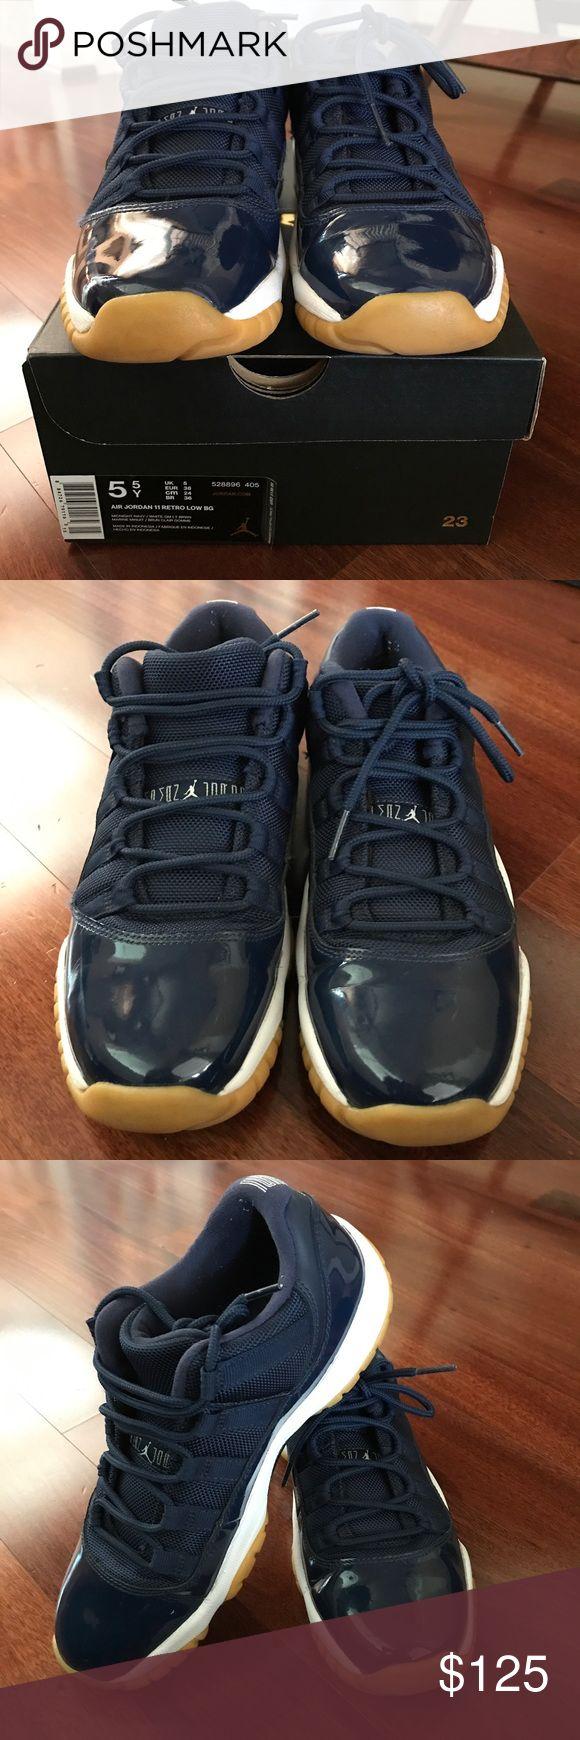 Air Jordan 11 Retro Low BG (size 5.5Y) Very good condition. Size 5.5Y (38 EUR). Midnight navy/white/gumsole. Air Jordan Shoes Sneakers